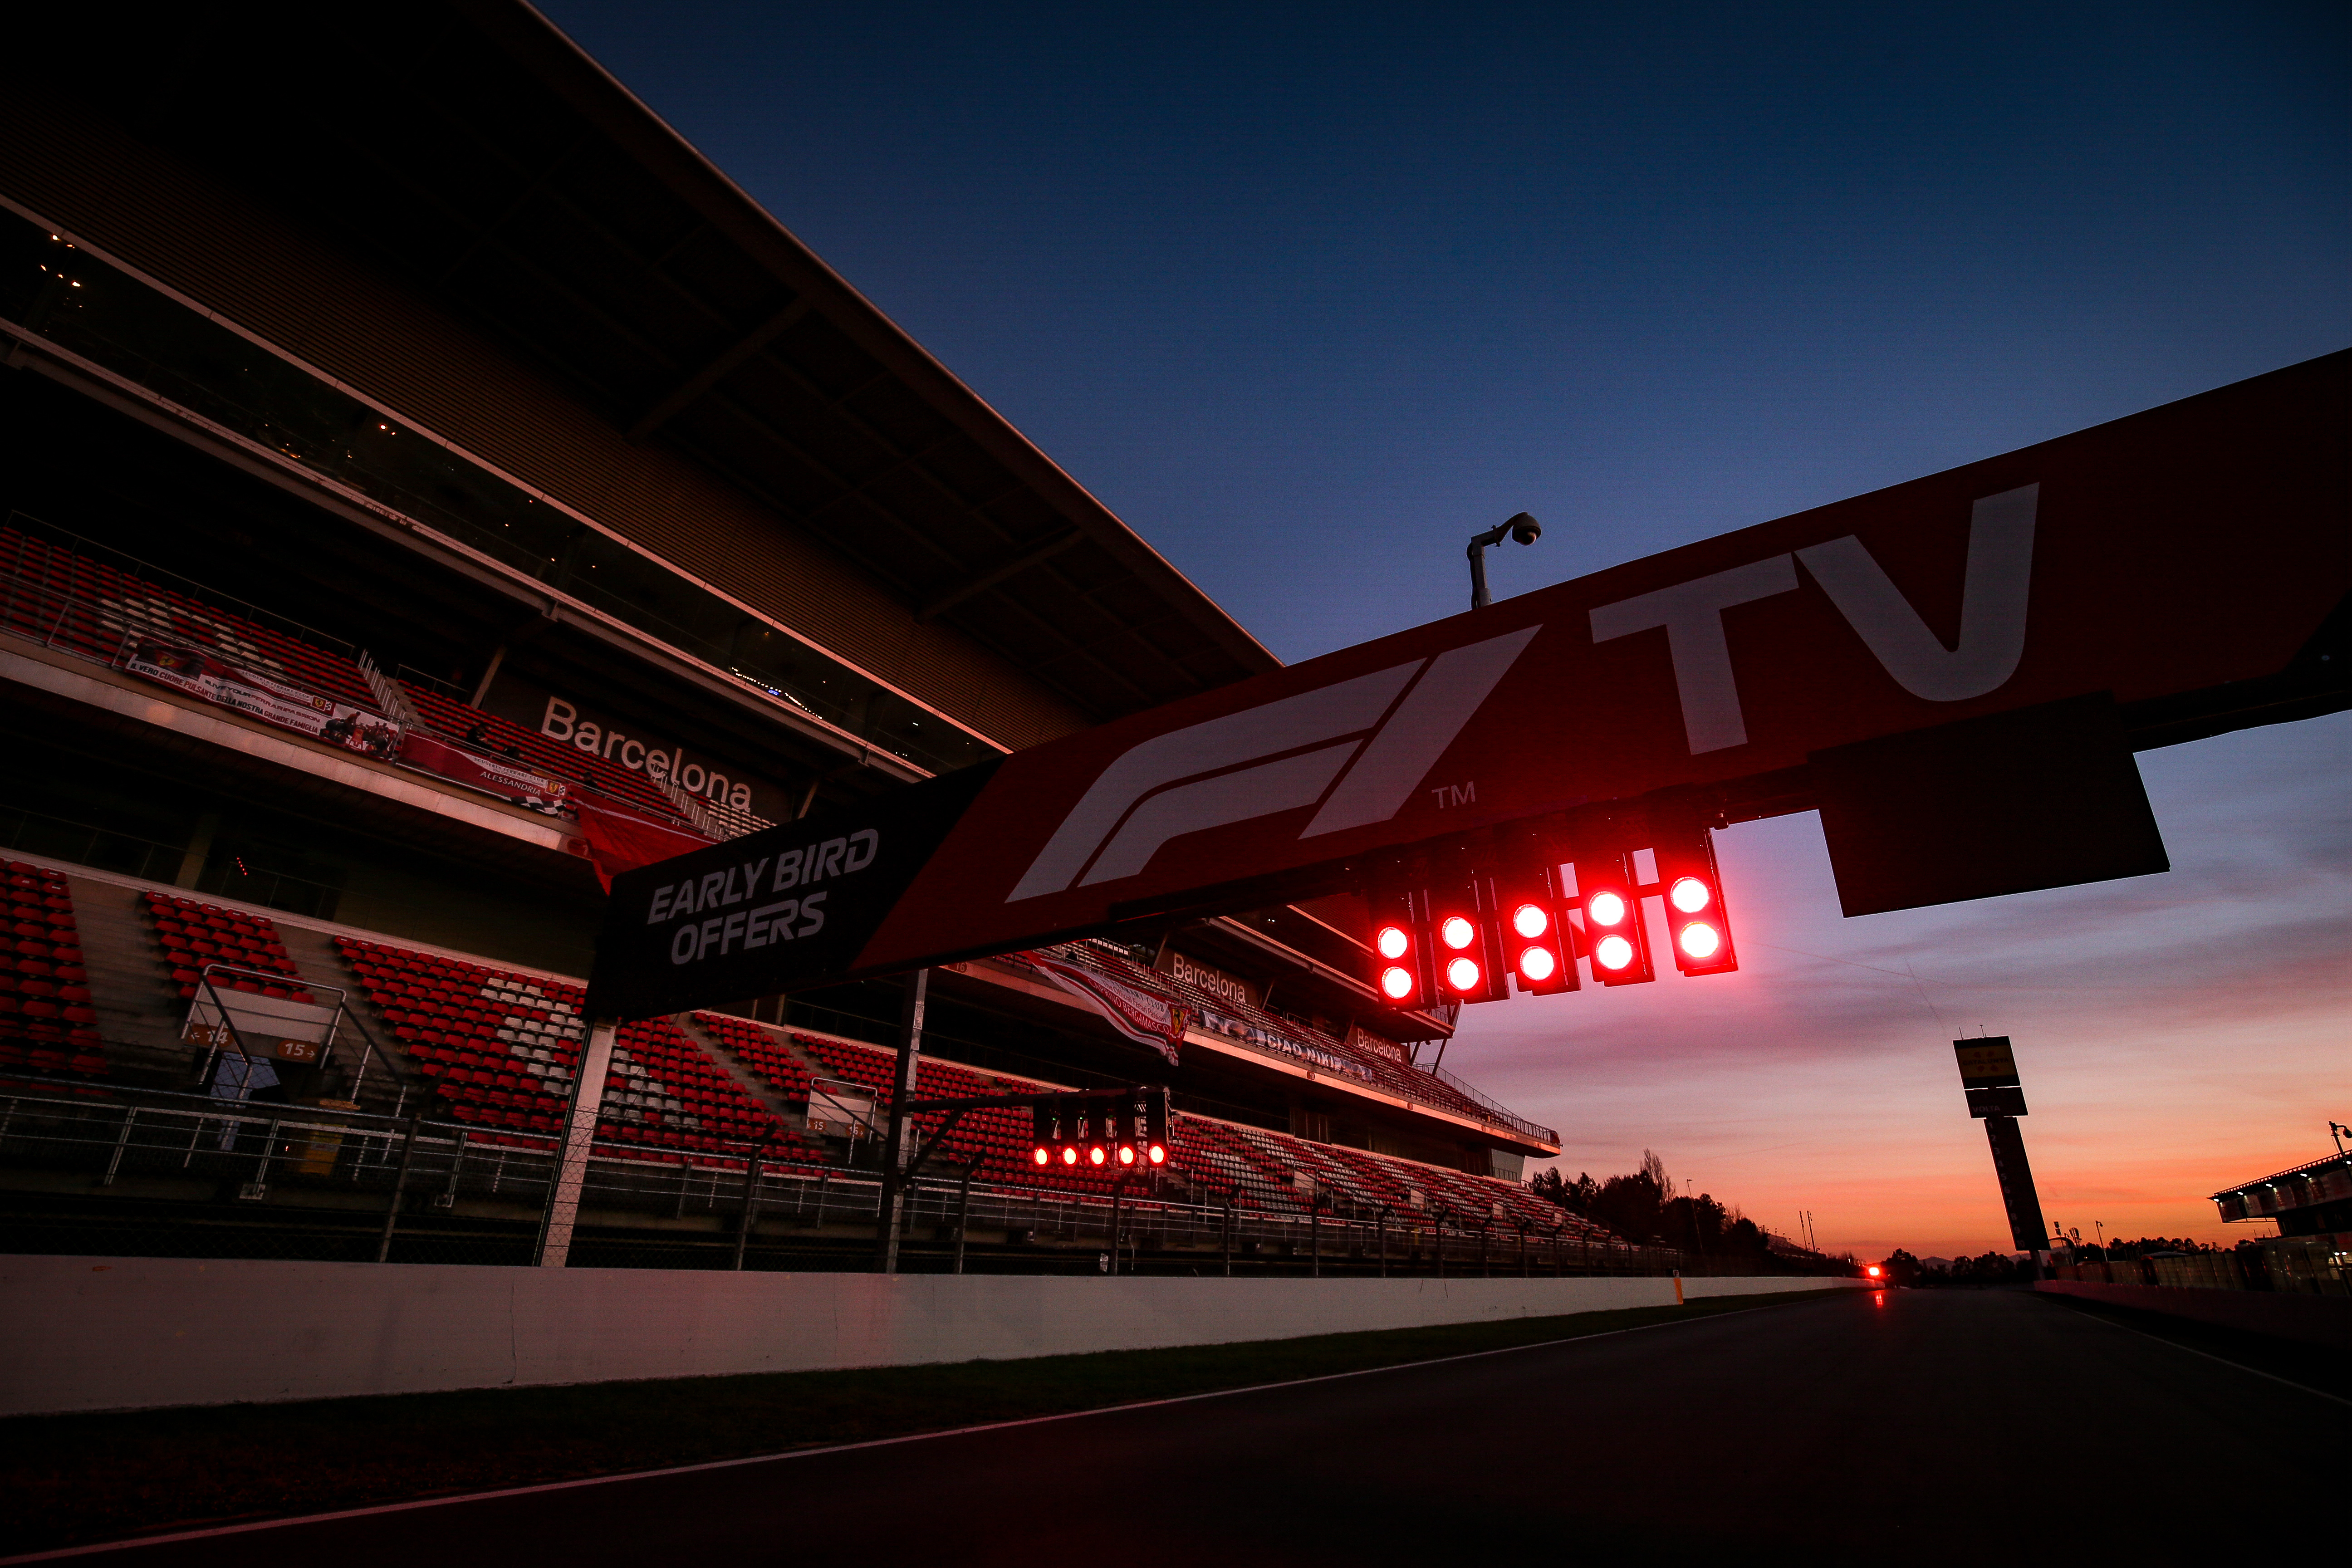 Barcelona testing F1 2020